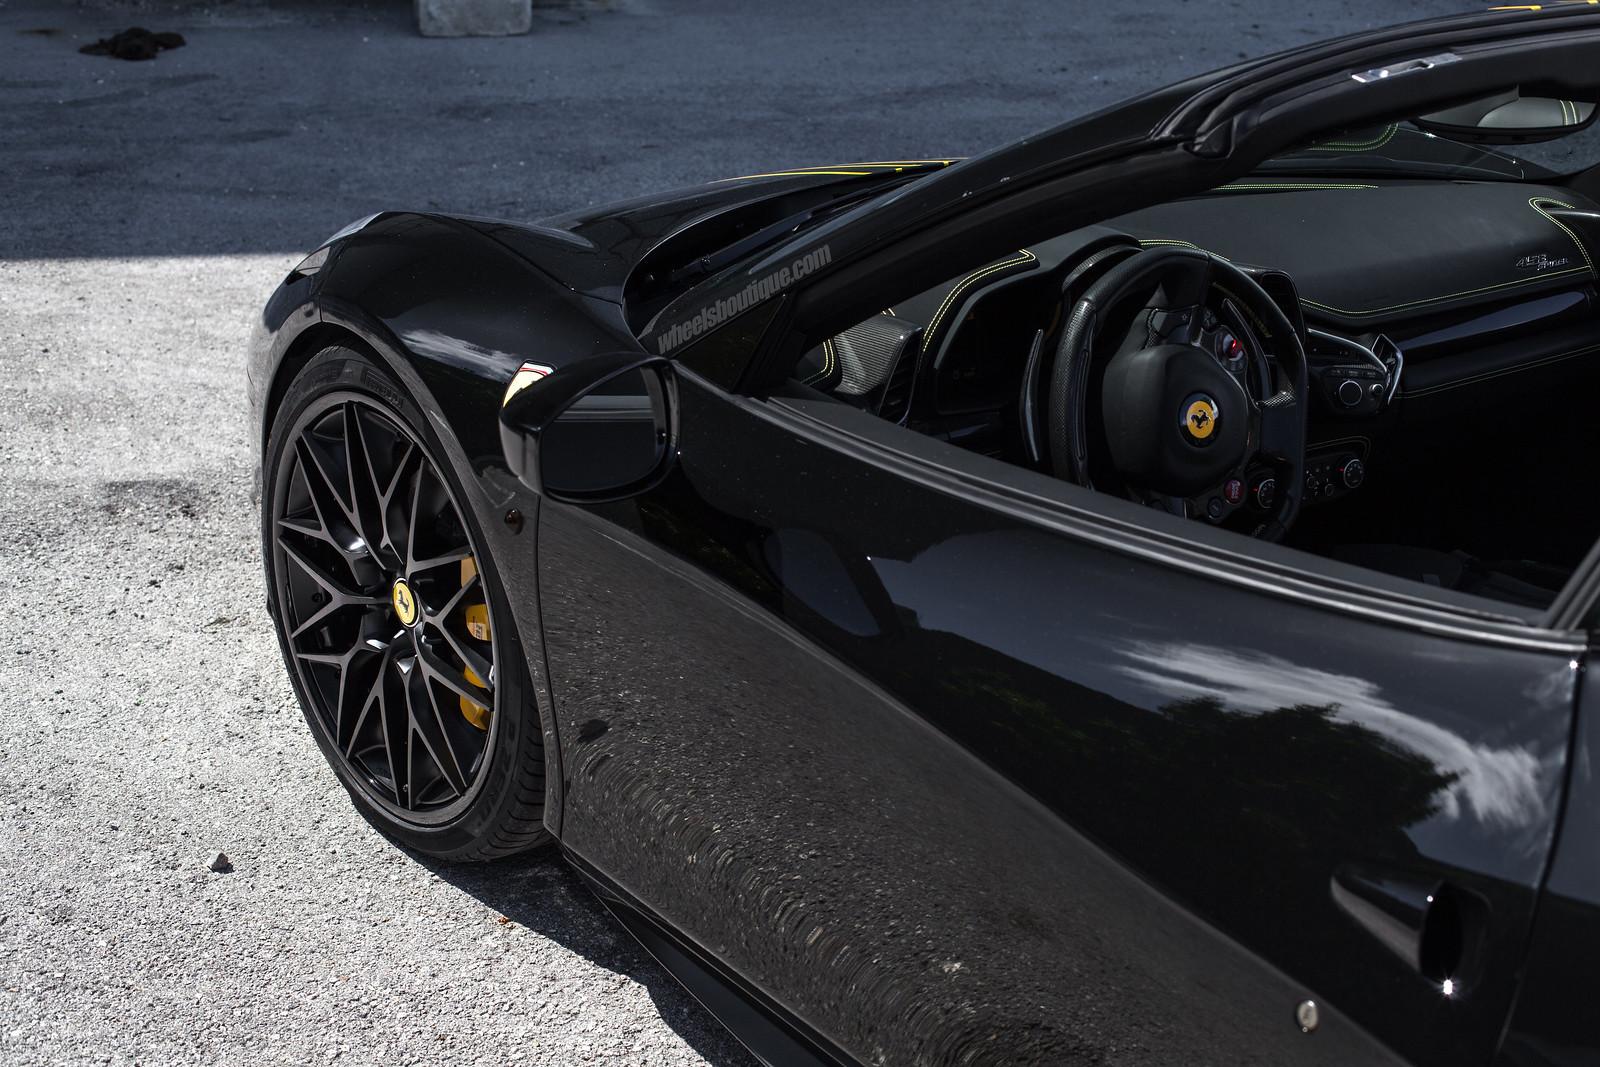 Bruce Wayne S 458 Spider Ferrari On Hre S200 S By Wheels Boutique